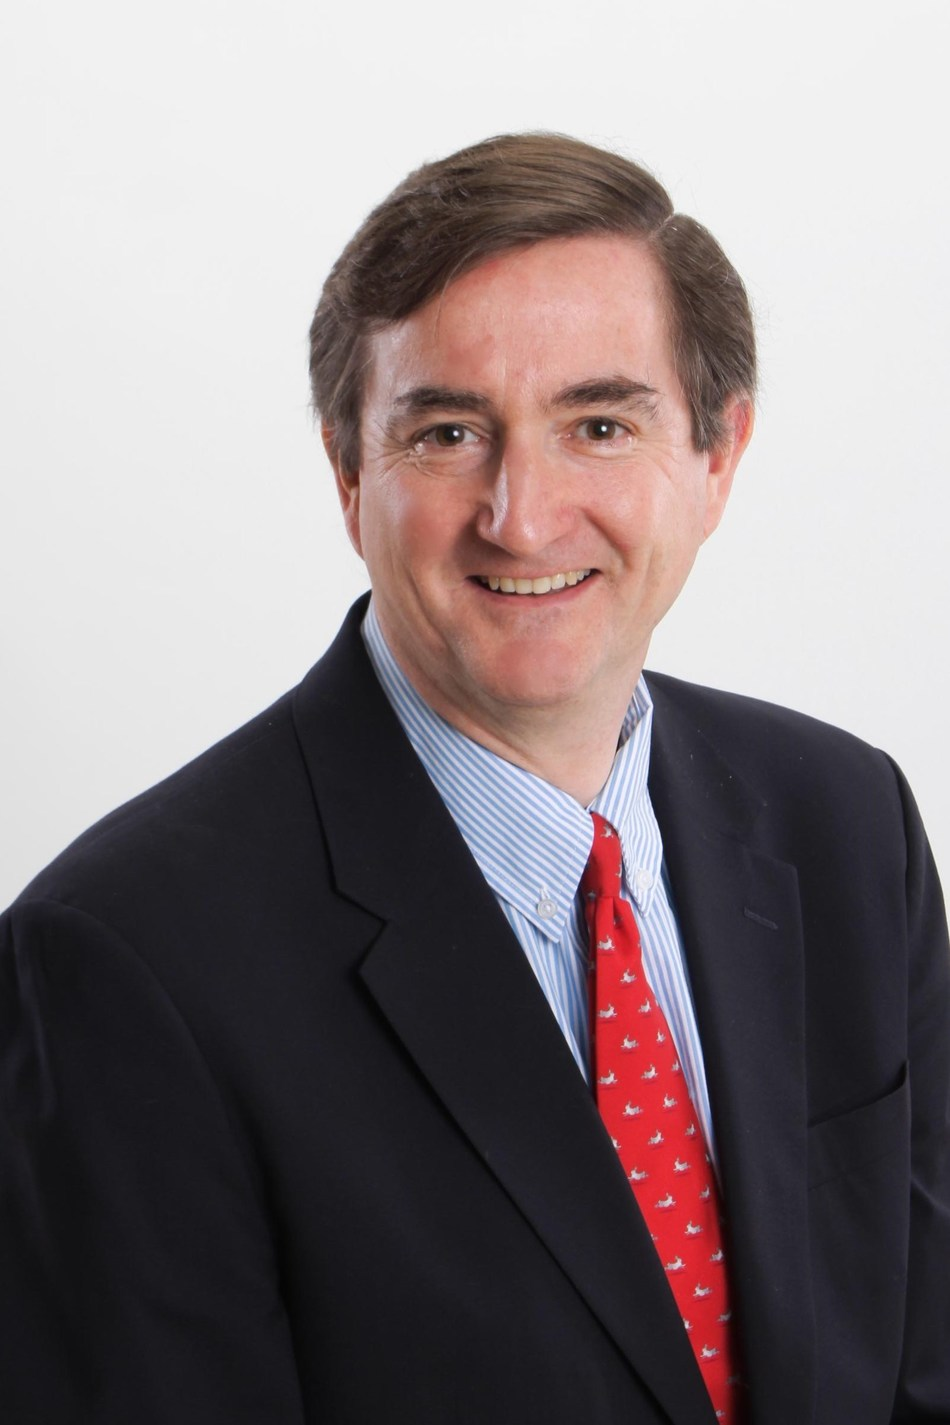 Dr. David L. Mahoney, Chief Medical Officer of Lifeline Vascular Access